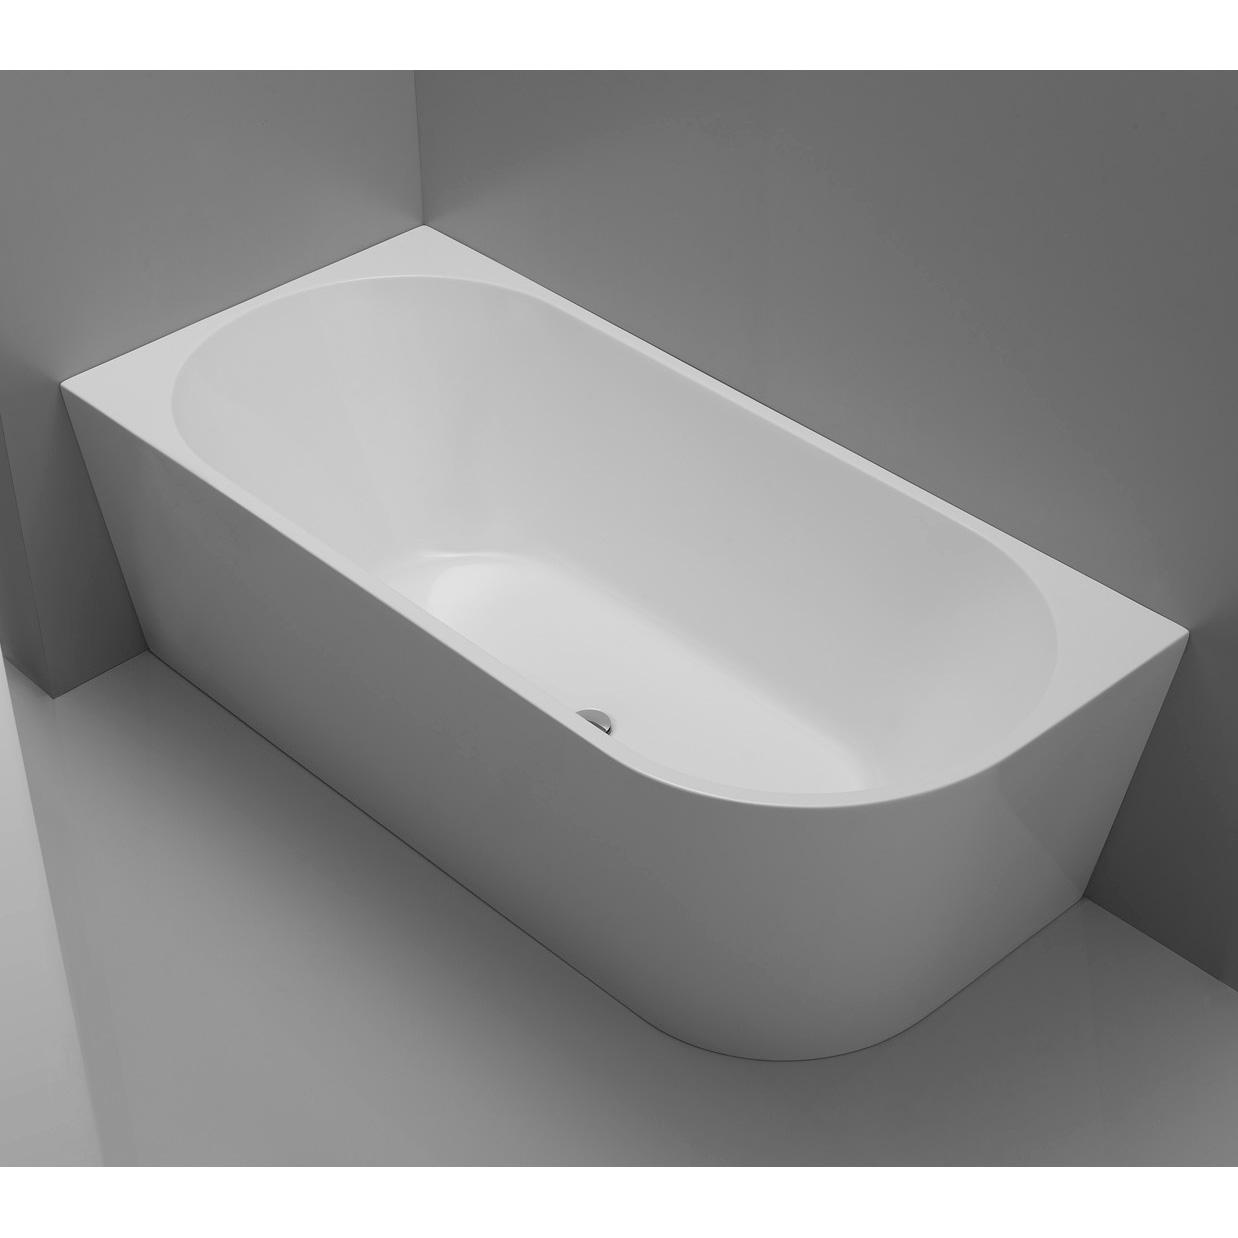 Акриловая ванна Belbagno BB79-1500L акриловая ванна belbagno bb42 1700